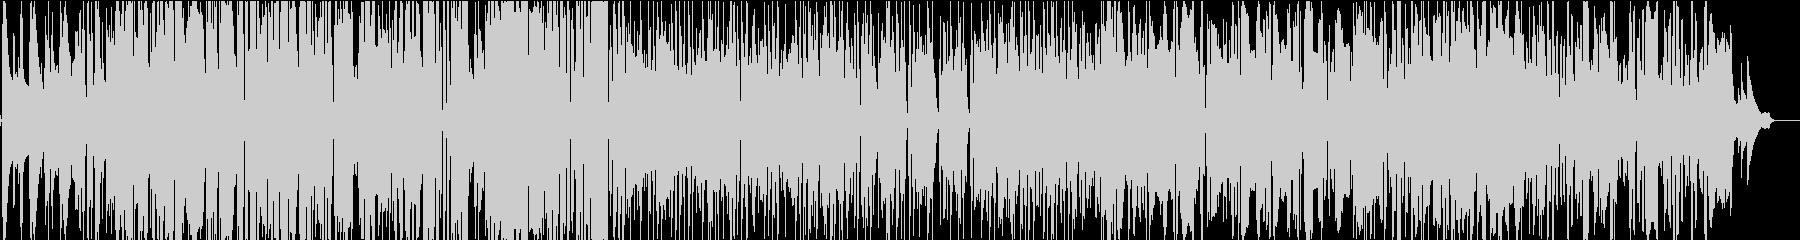 piano・TrpメインJazz_BGMの未再生の波形